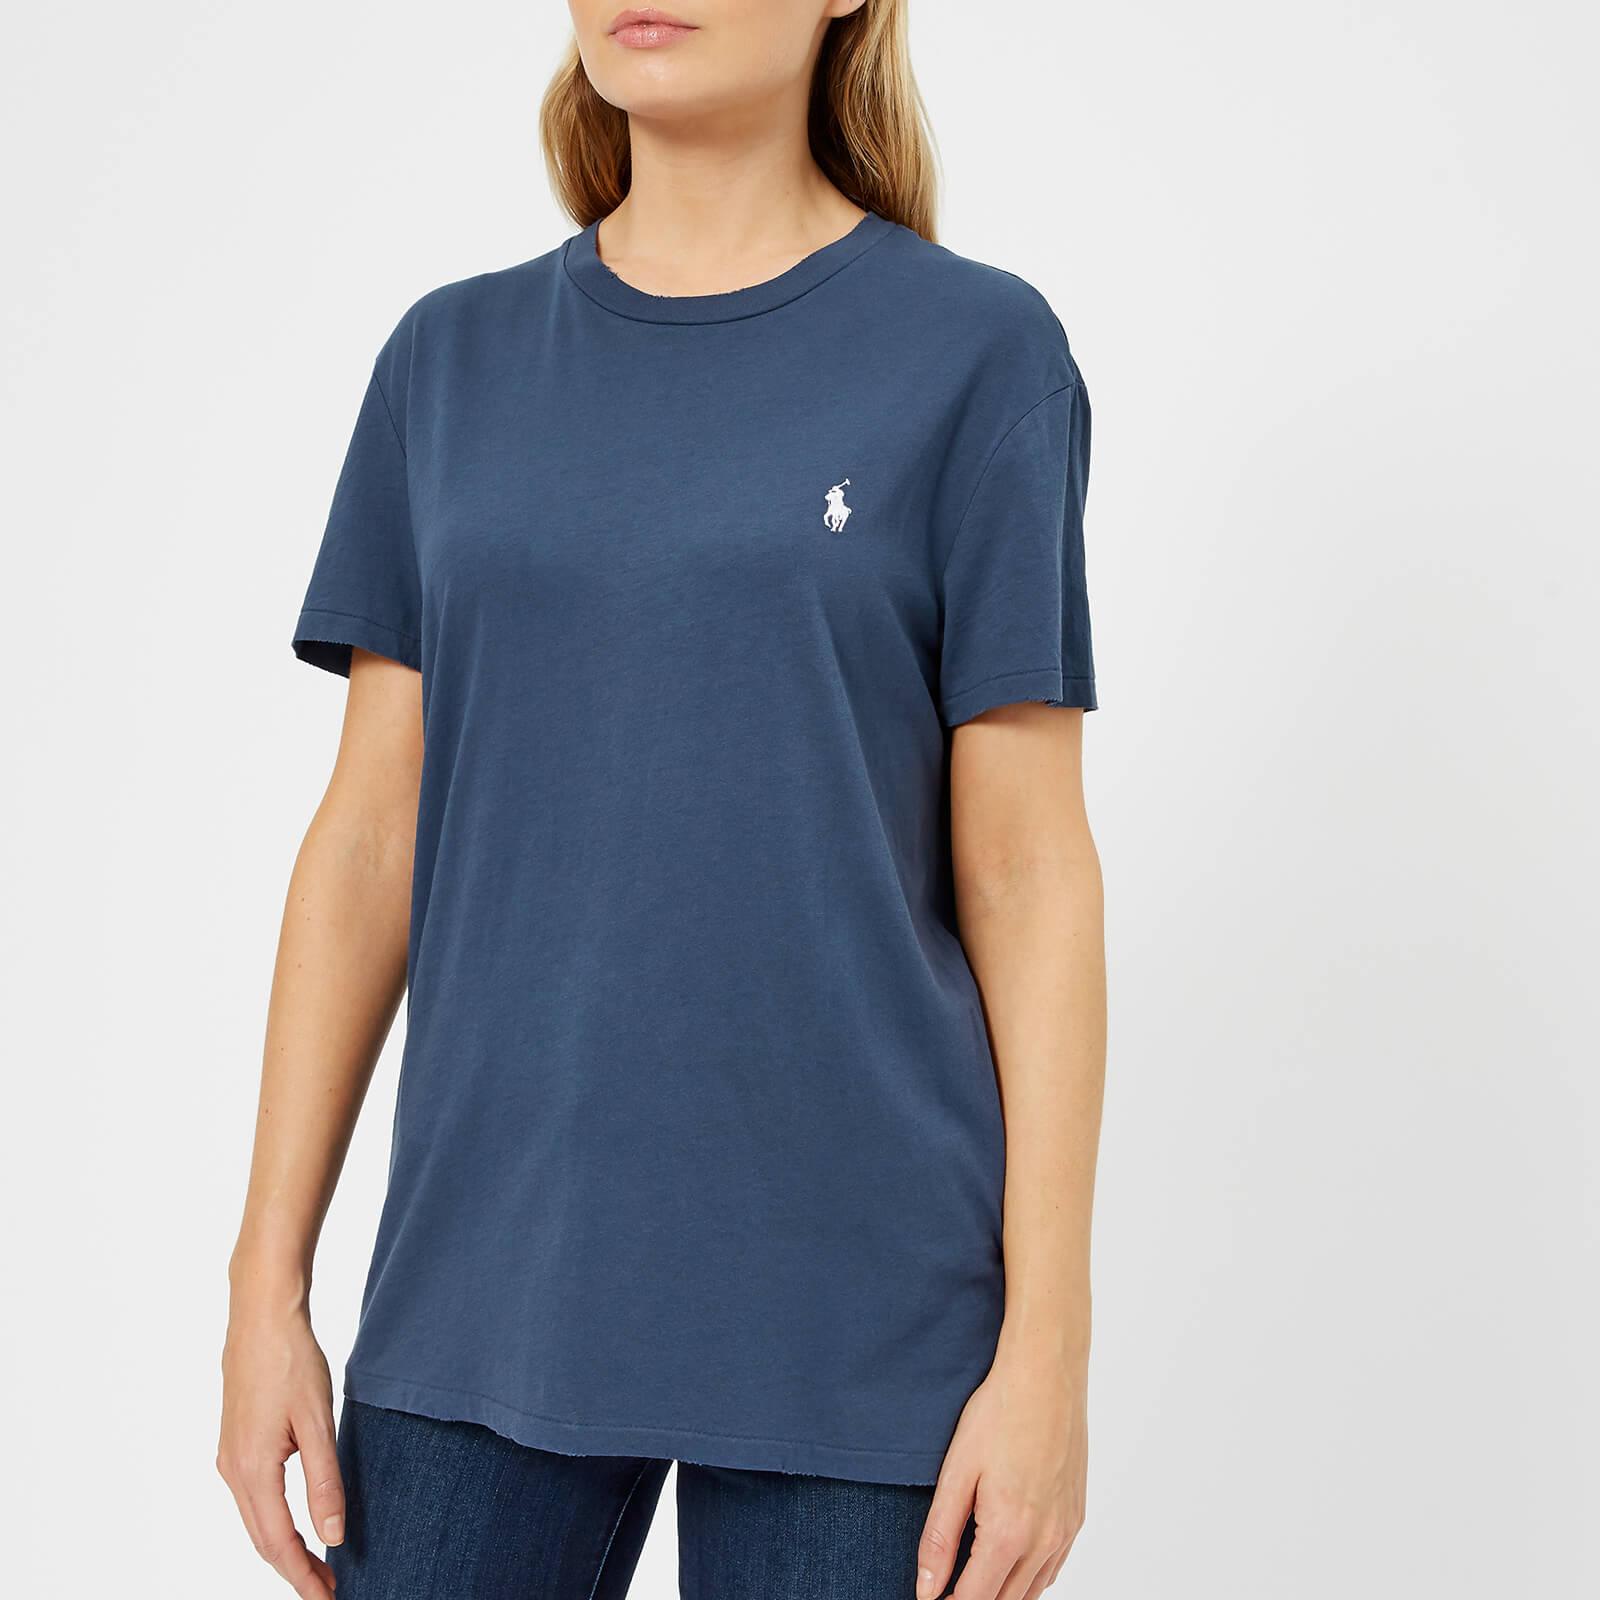 Lauren Oversized Logo Rustic Shirt Ralph T Polo Navy Women's qO7Itw55